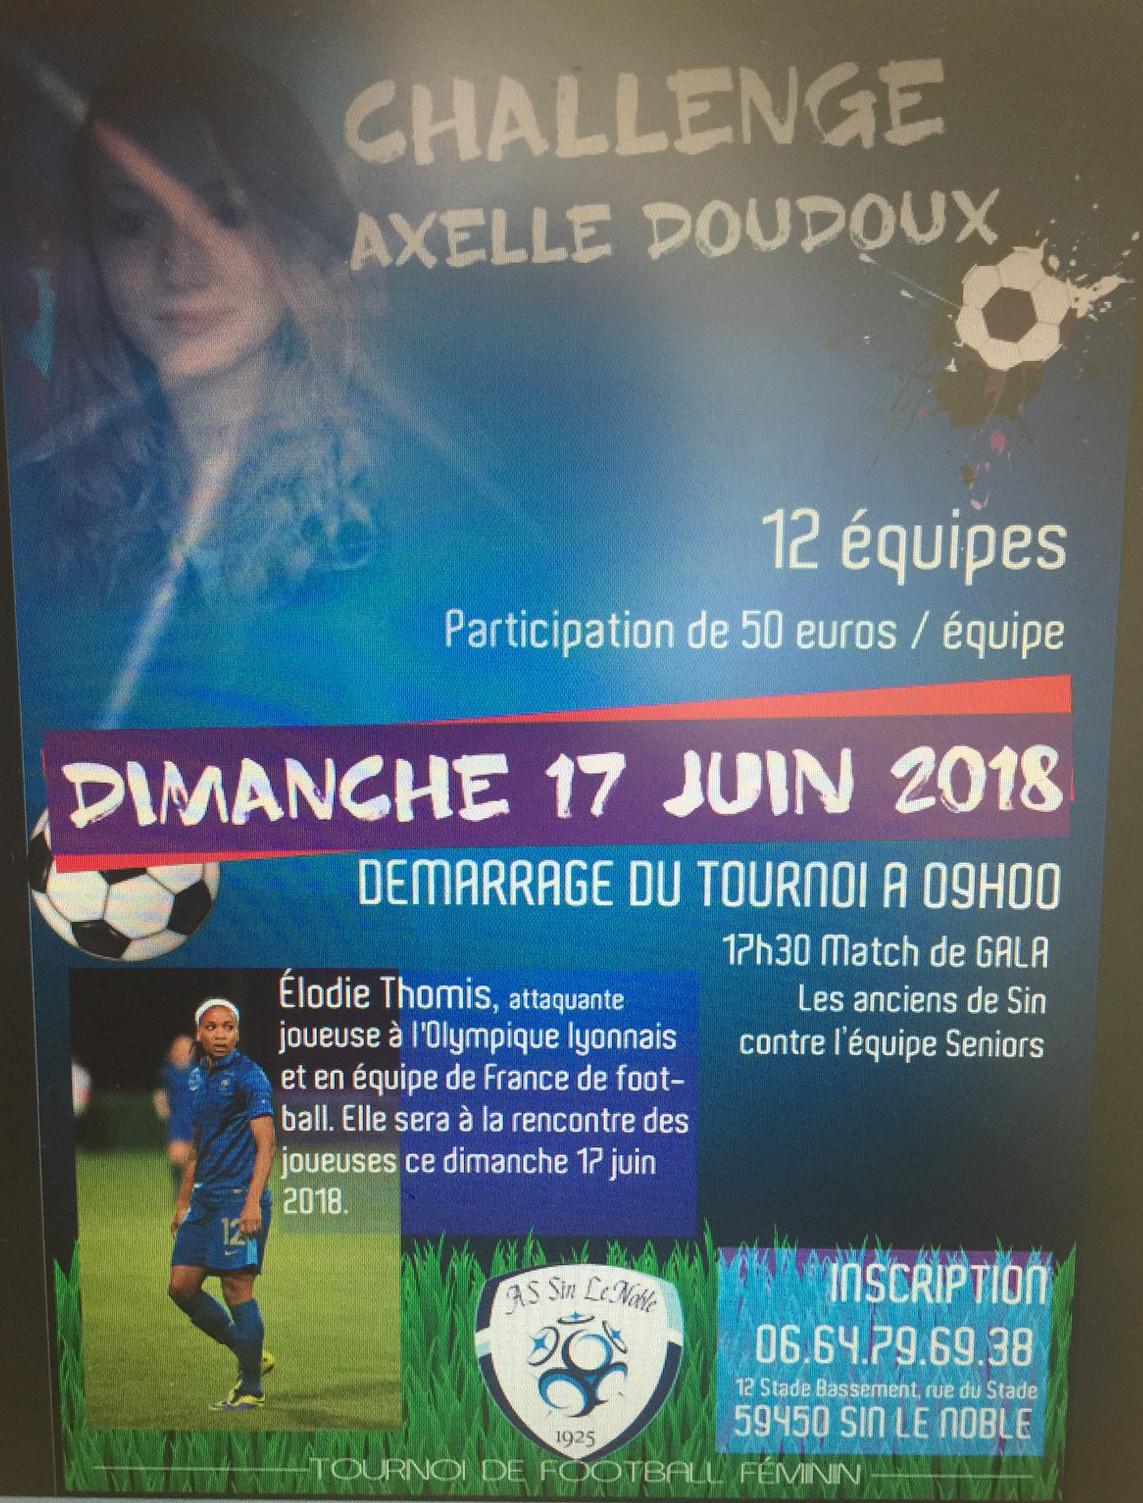 20180611_Tournoi Feminin.jpg